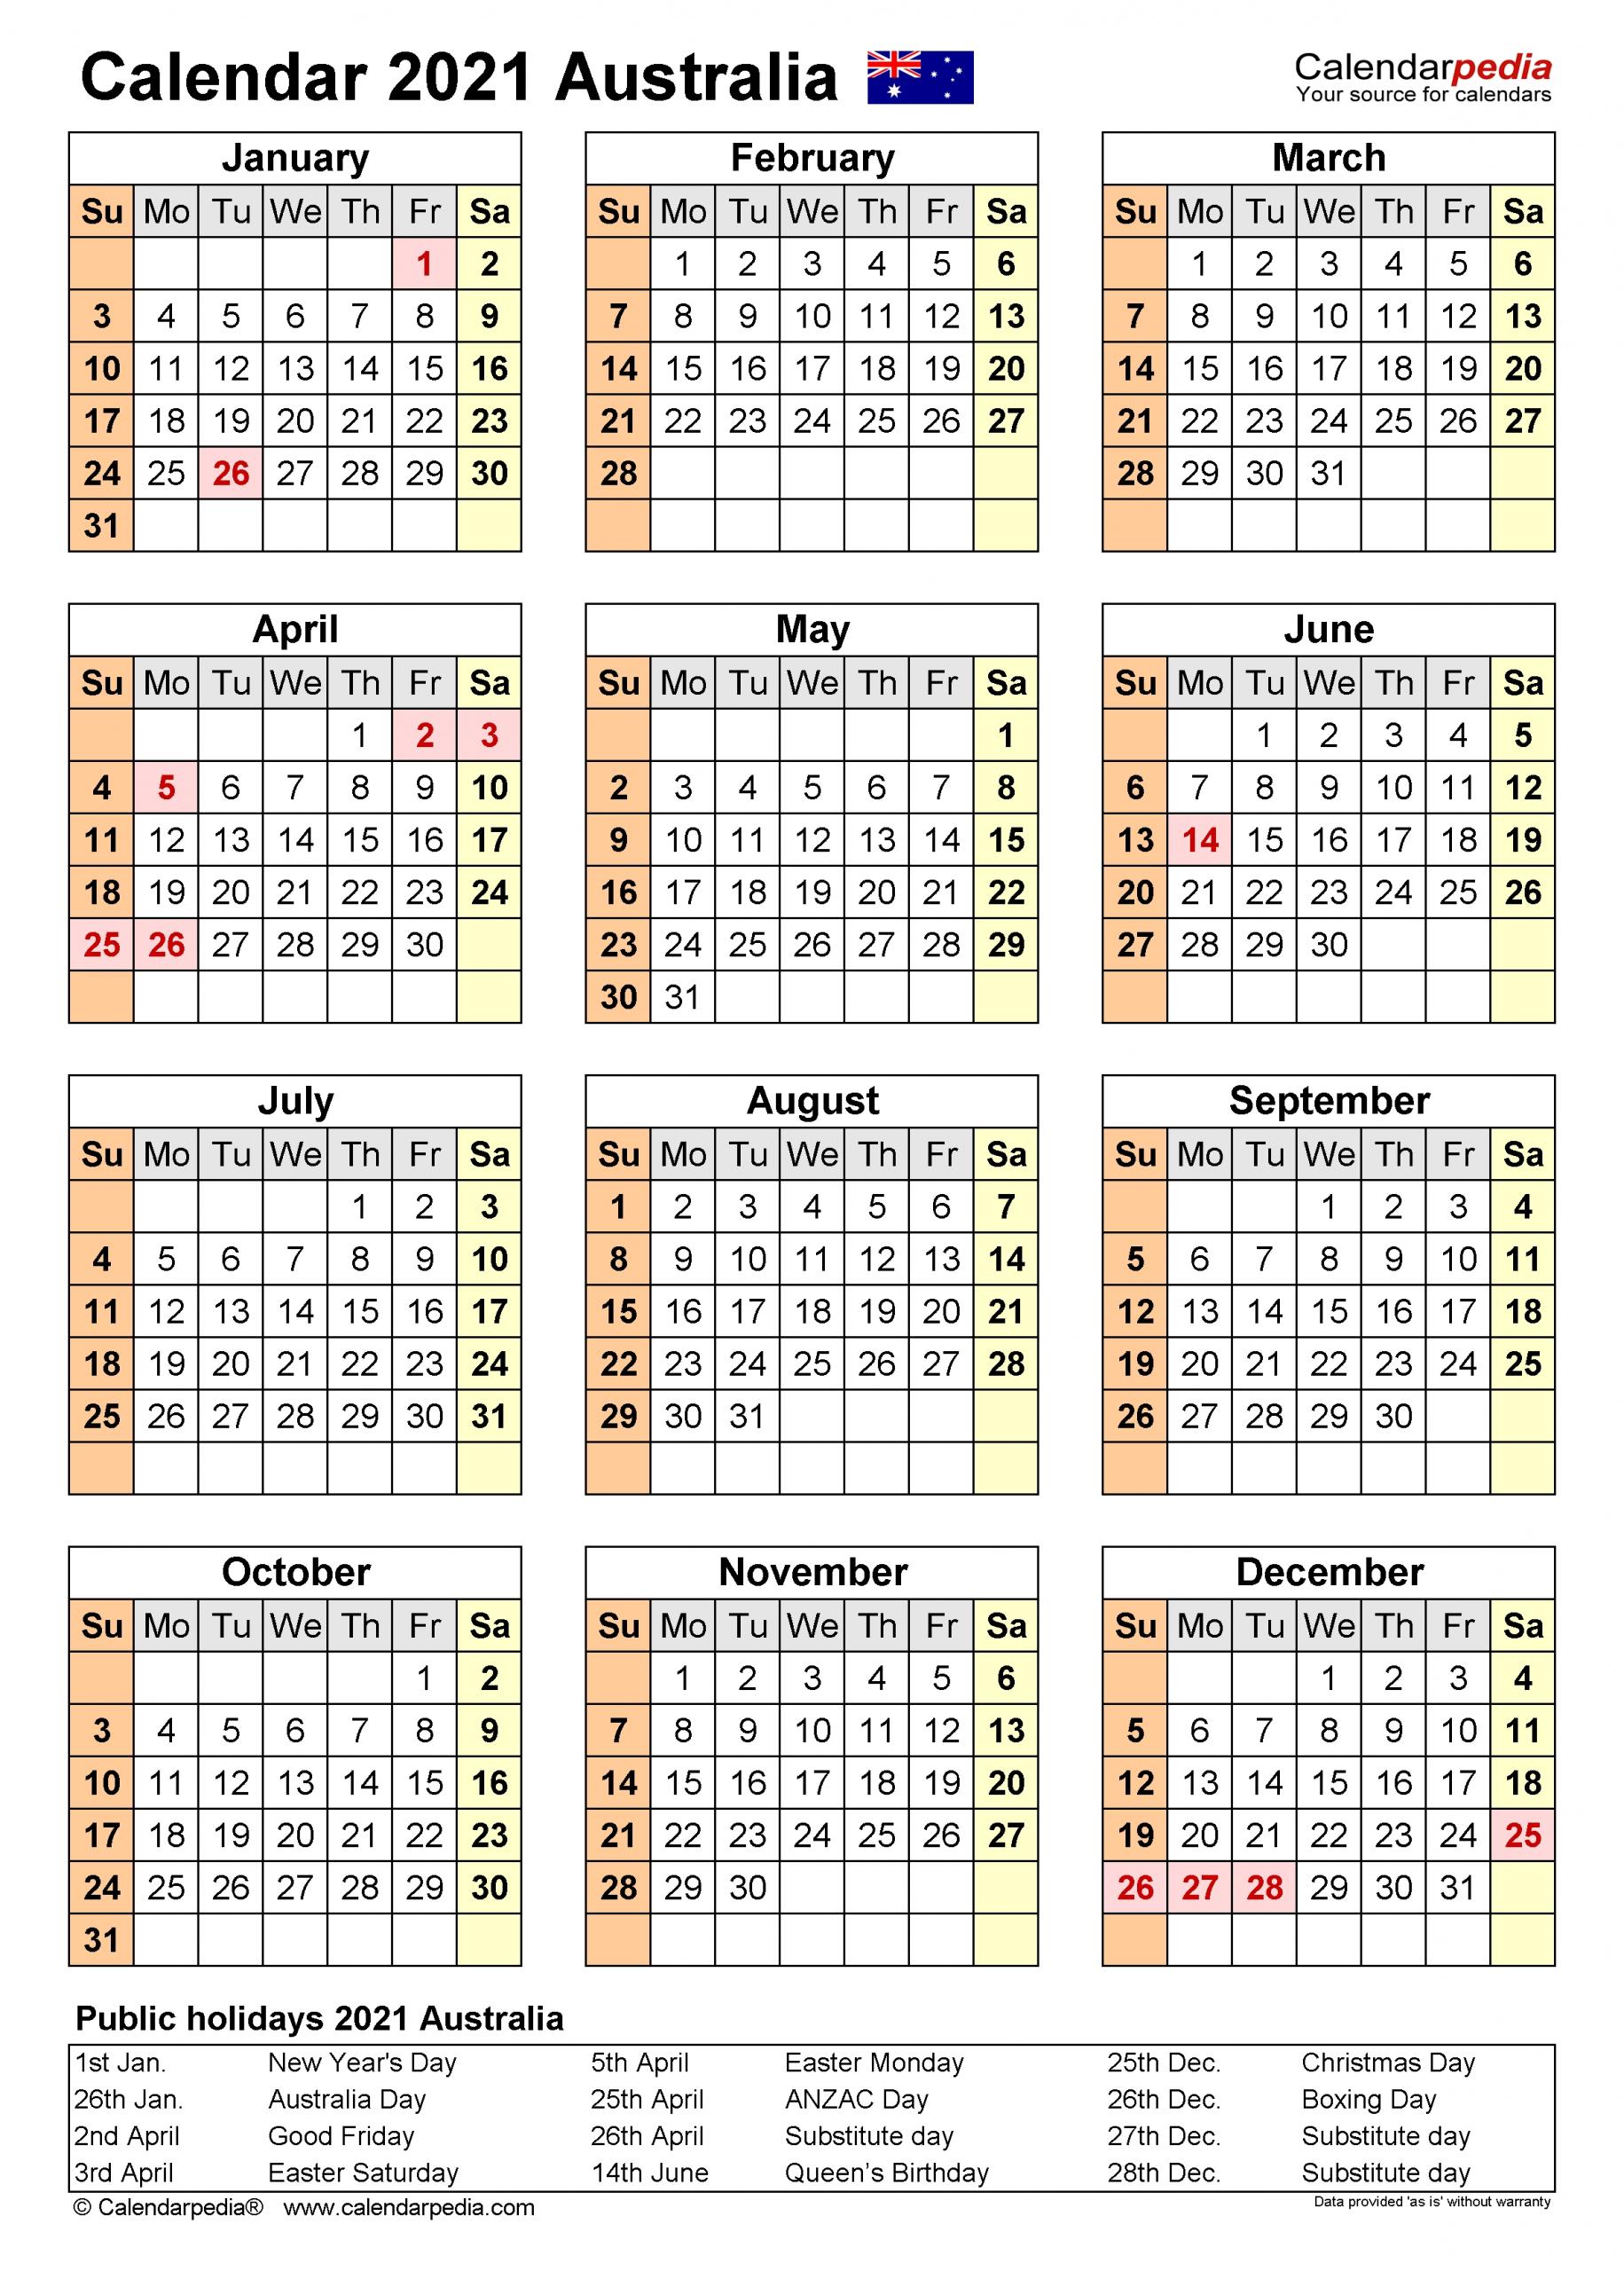 Australia Calendar 2021 - Free Printable Pdf Templates  What Financial Year In Australia